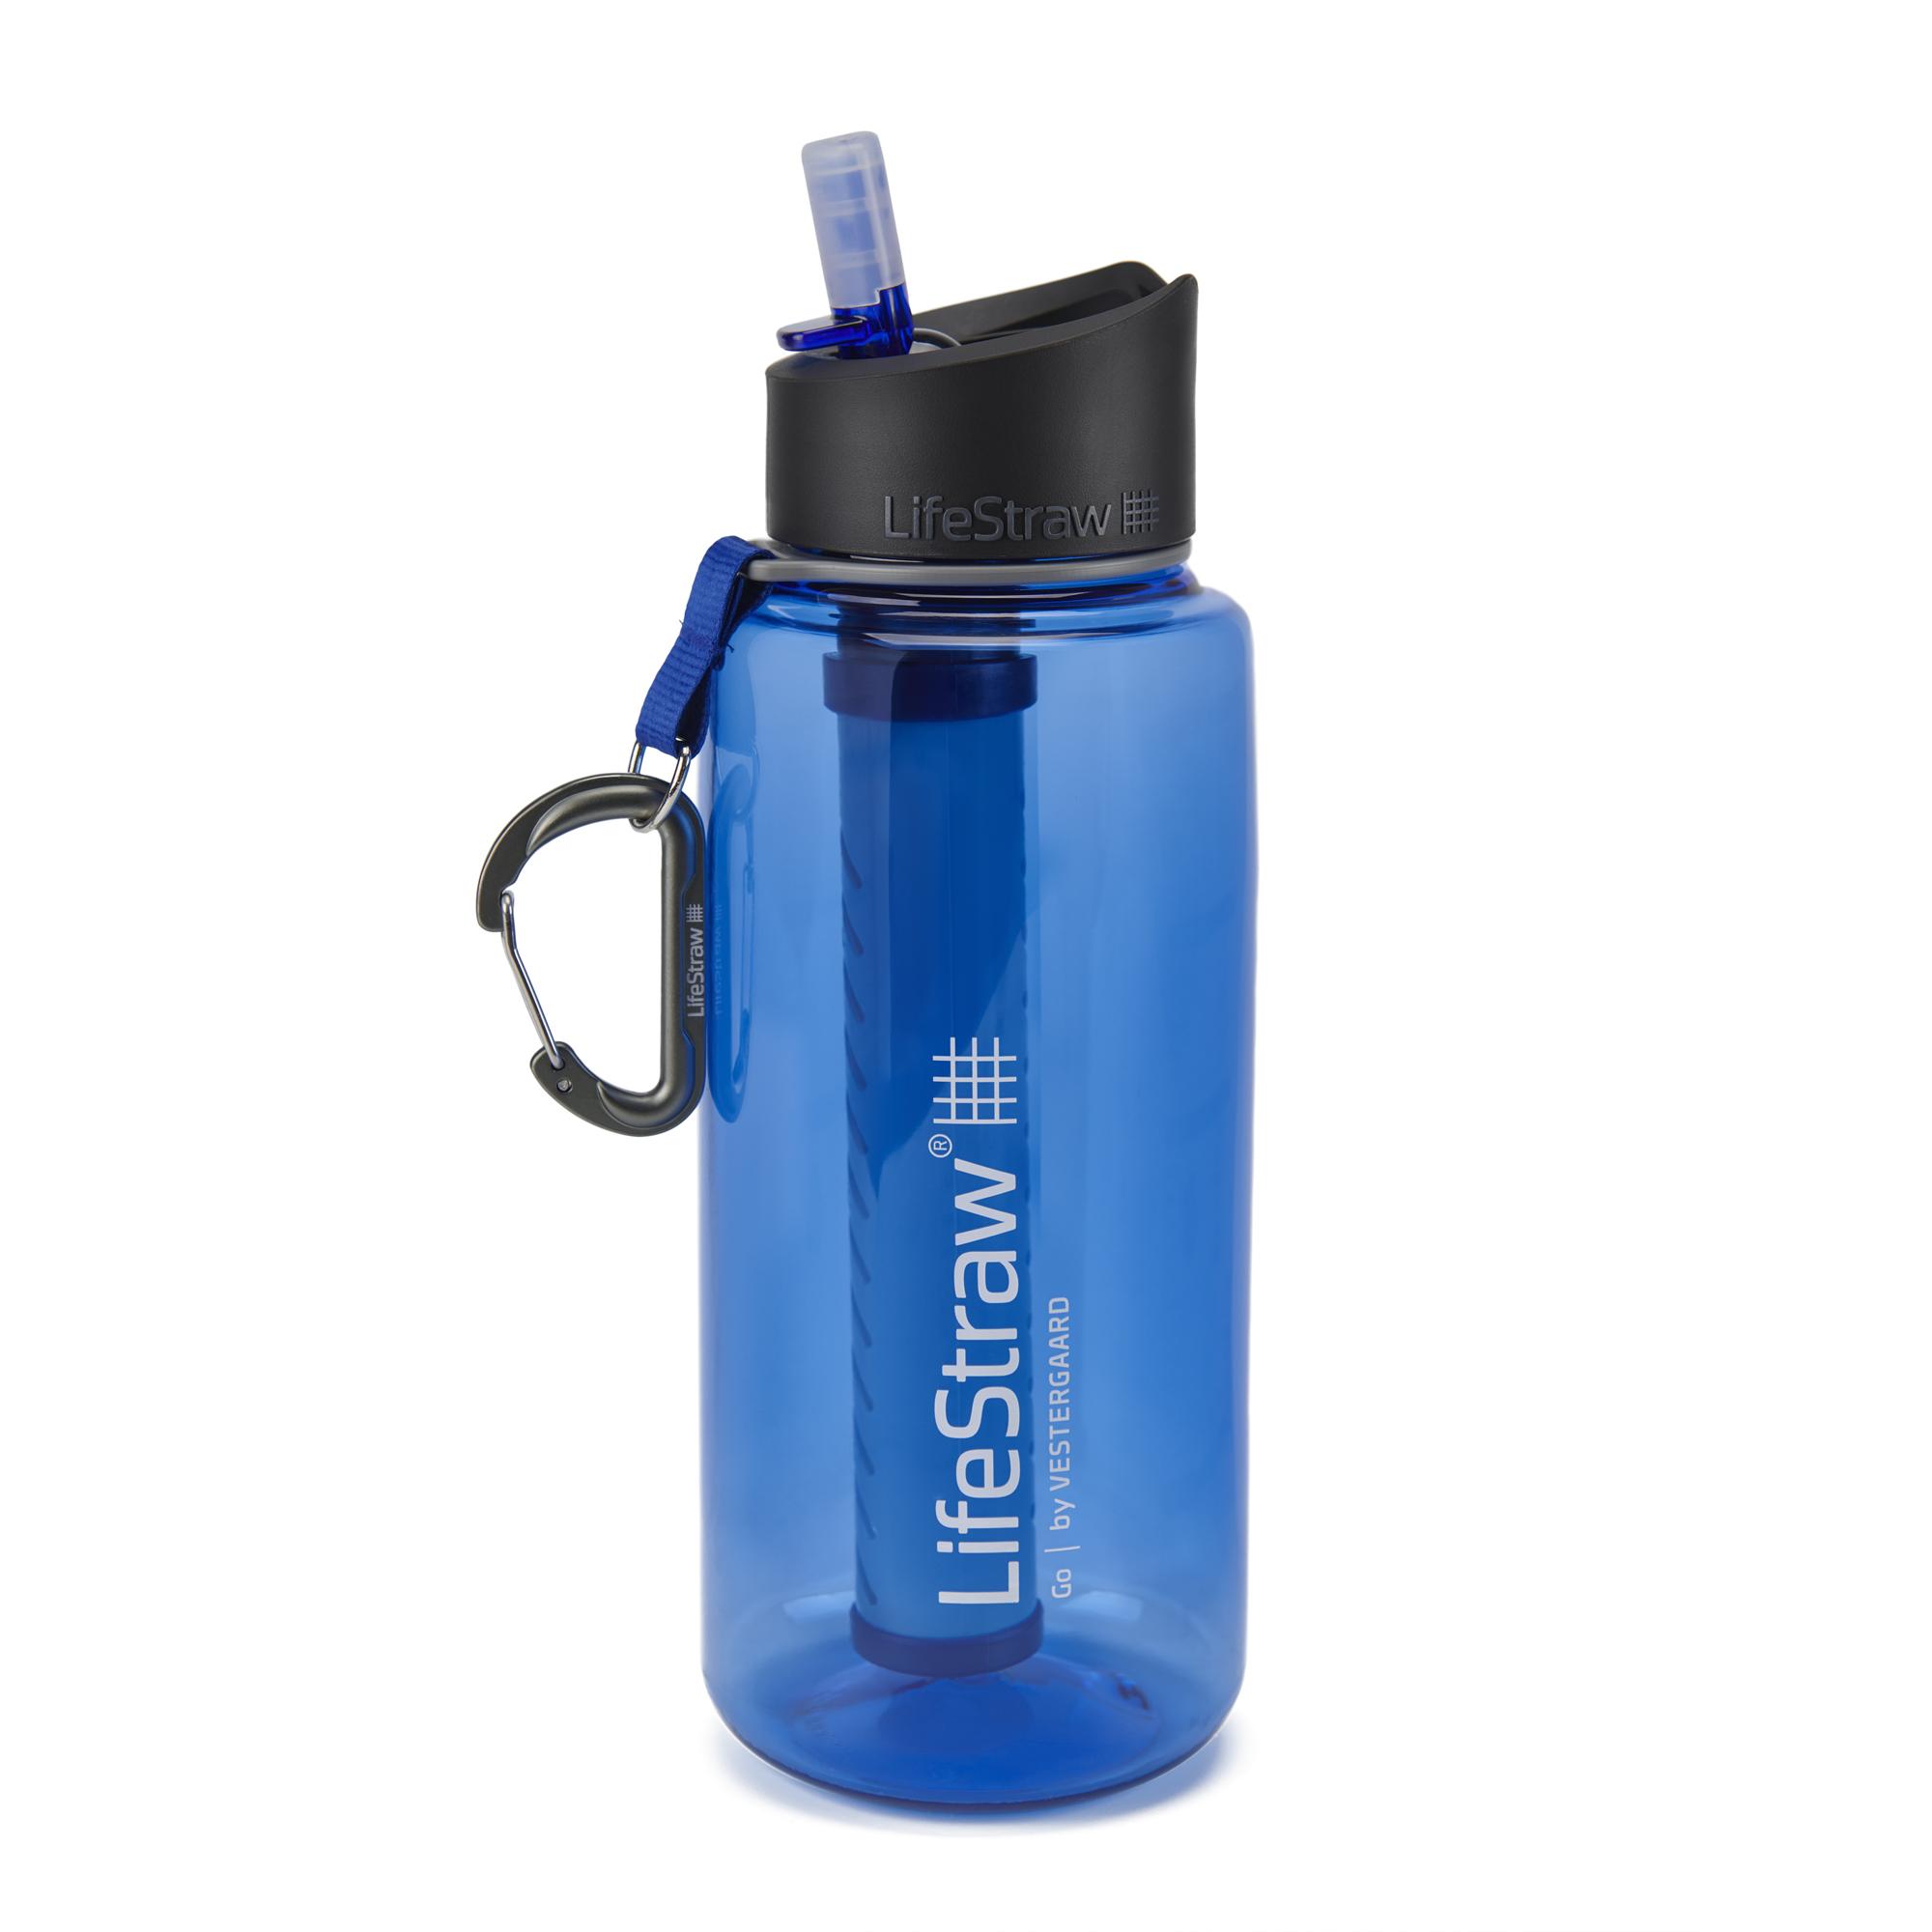 Im Test:   LifeStraw Go